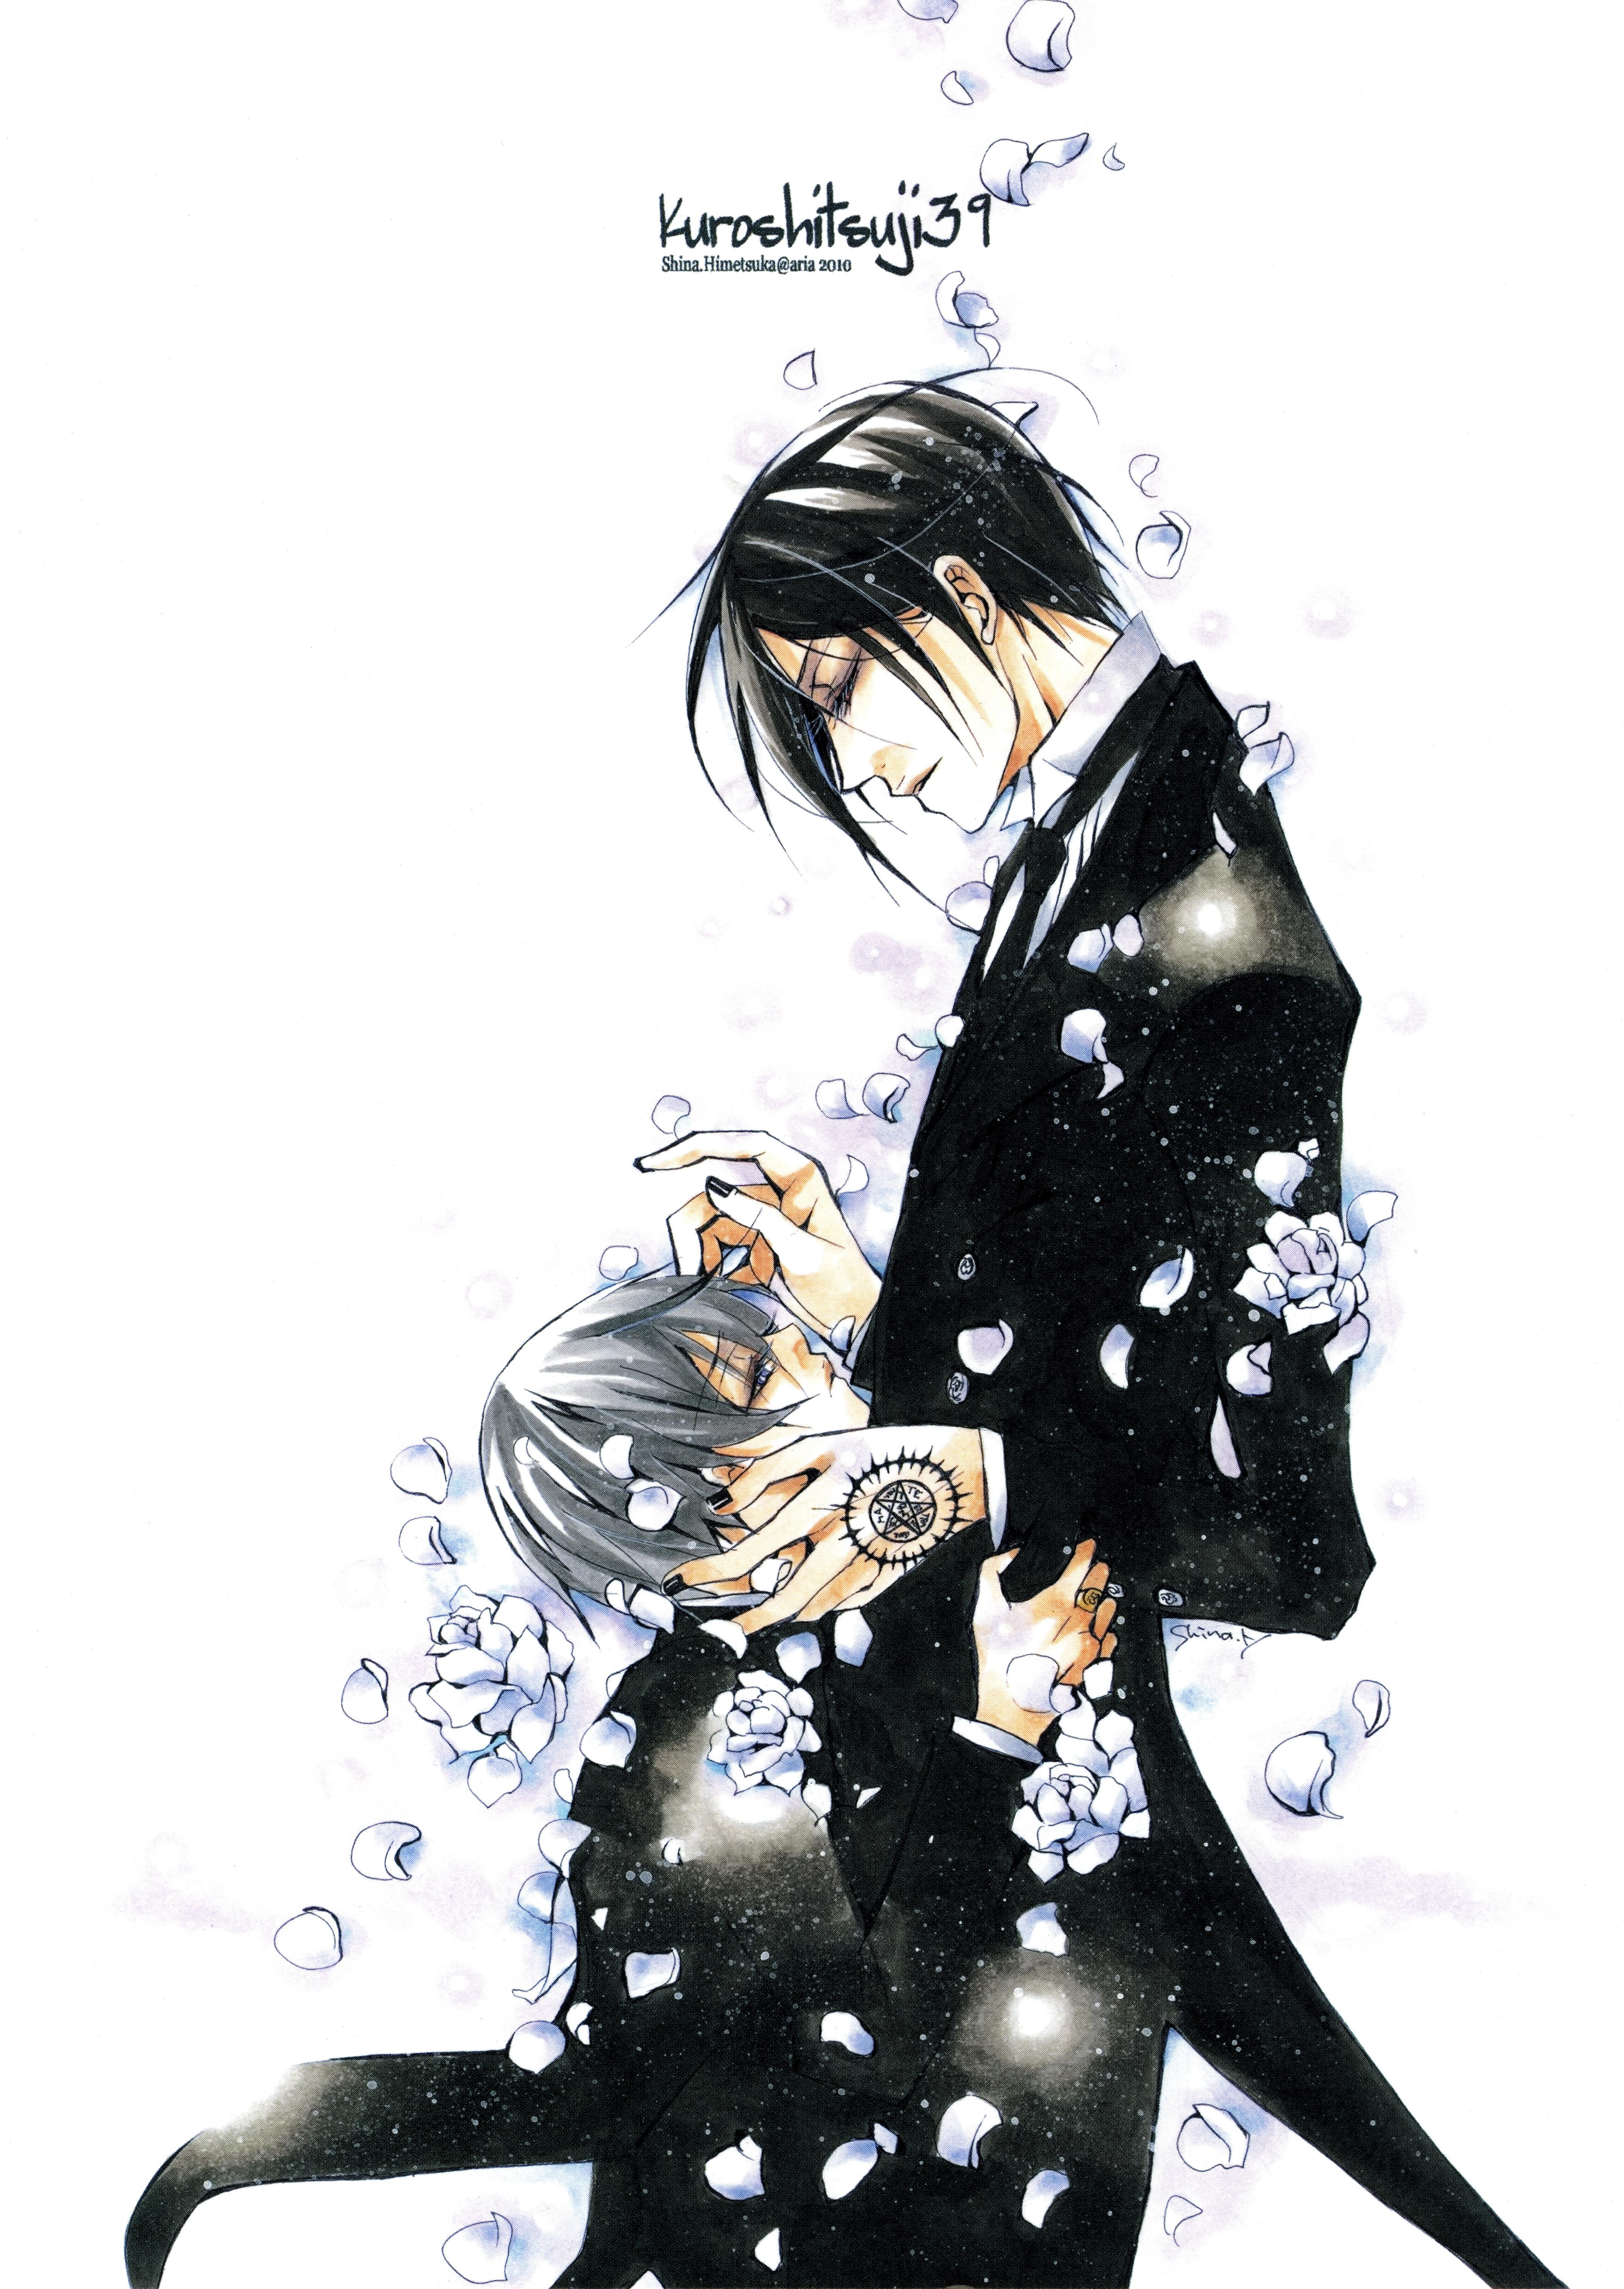 Kuroshitsuji black butler toboso yana mobile wallpaper 991130 zerochan anime image board - Mobel michaelis ...